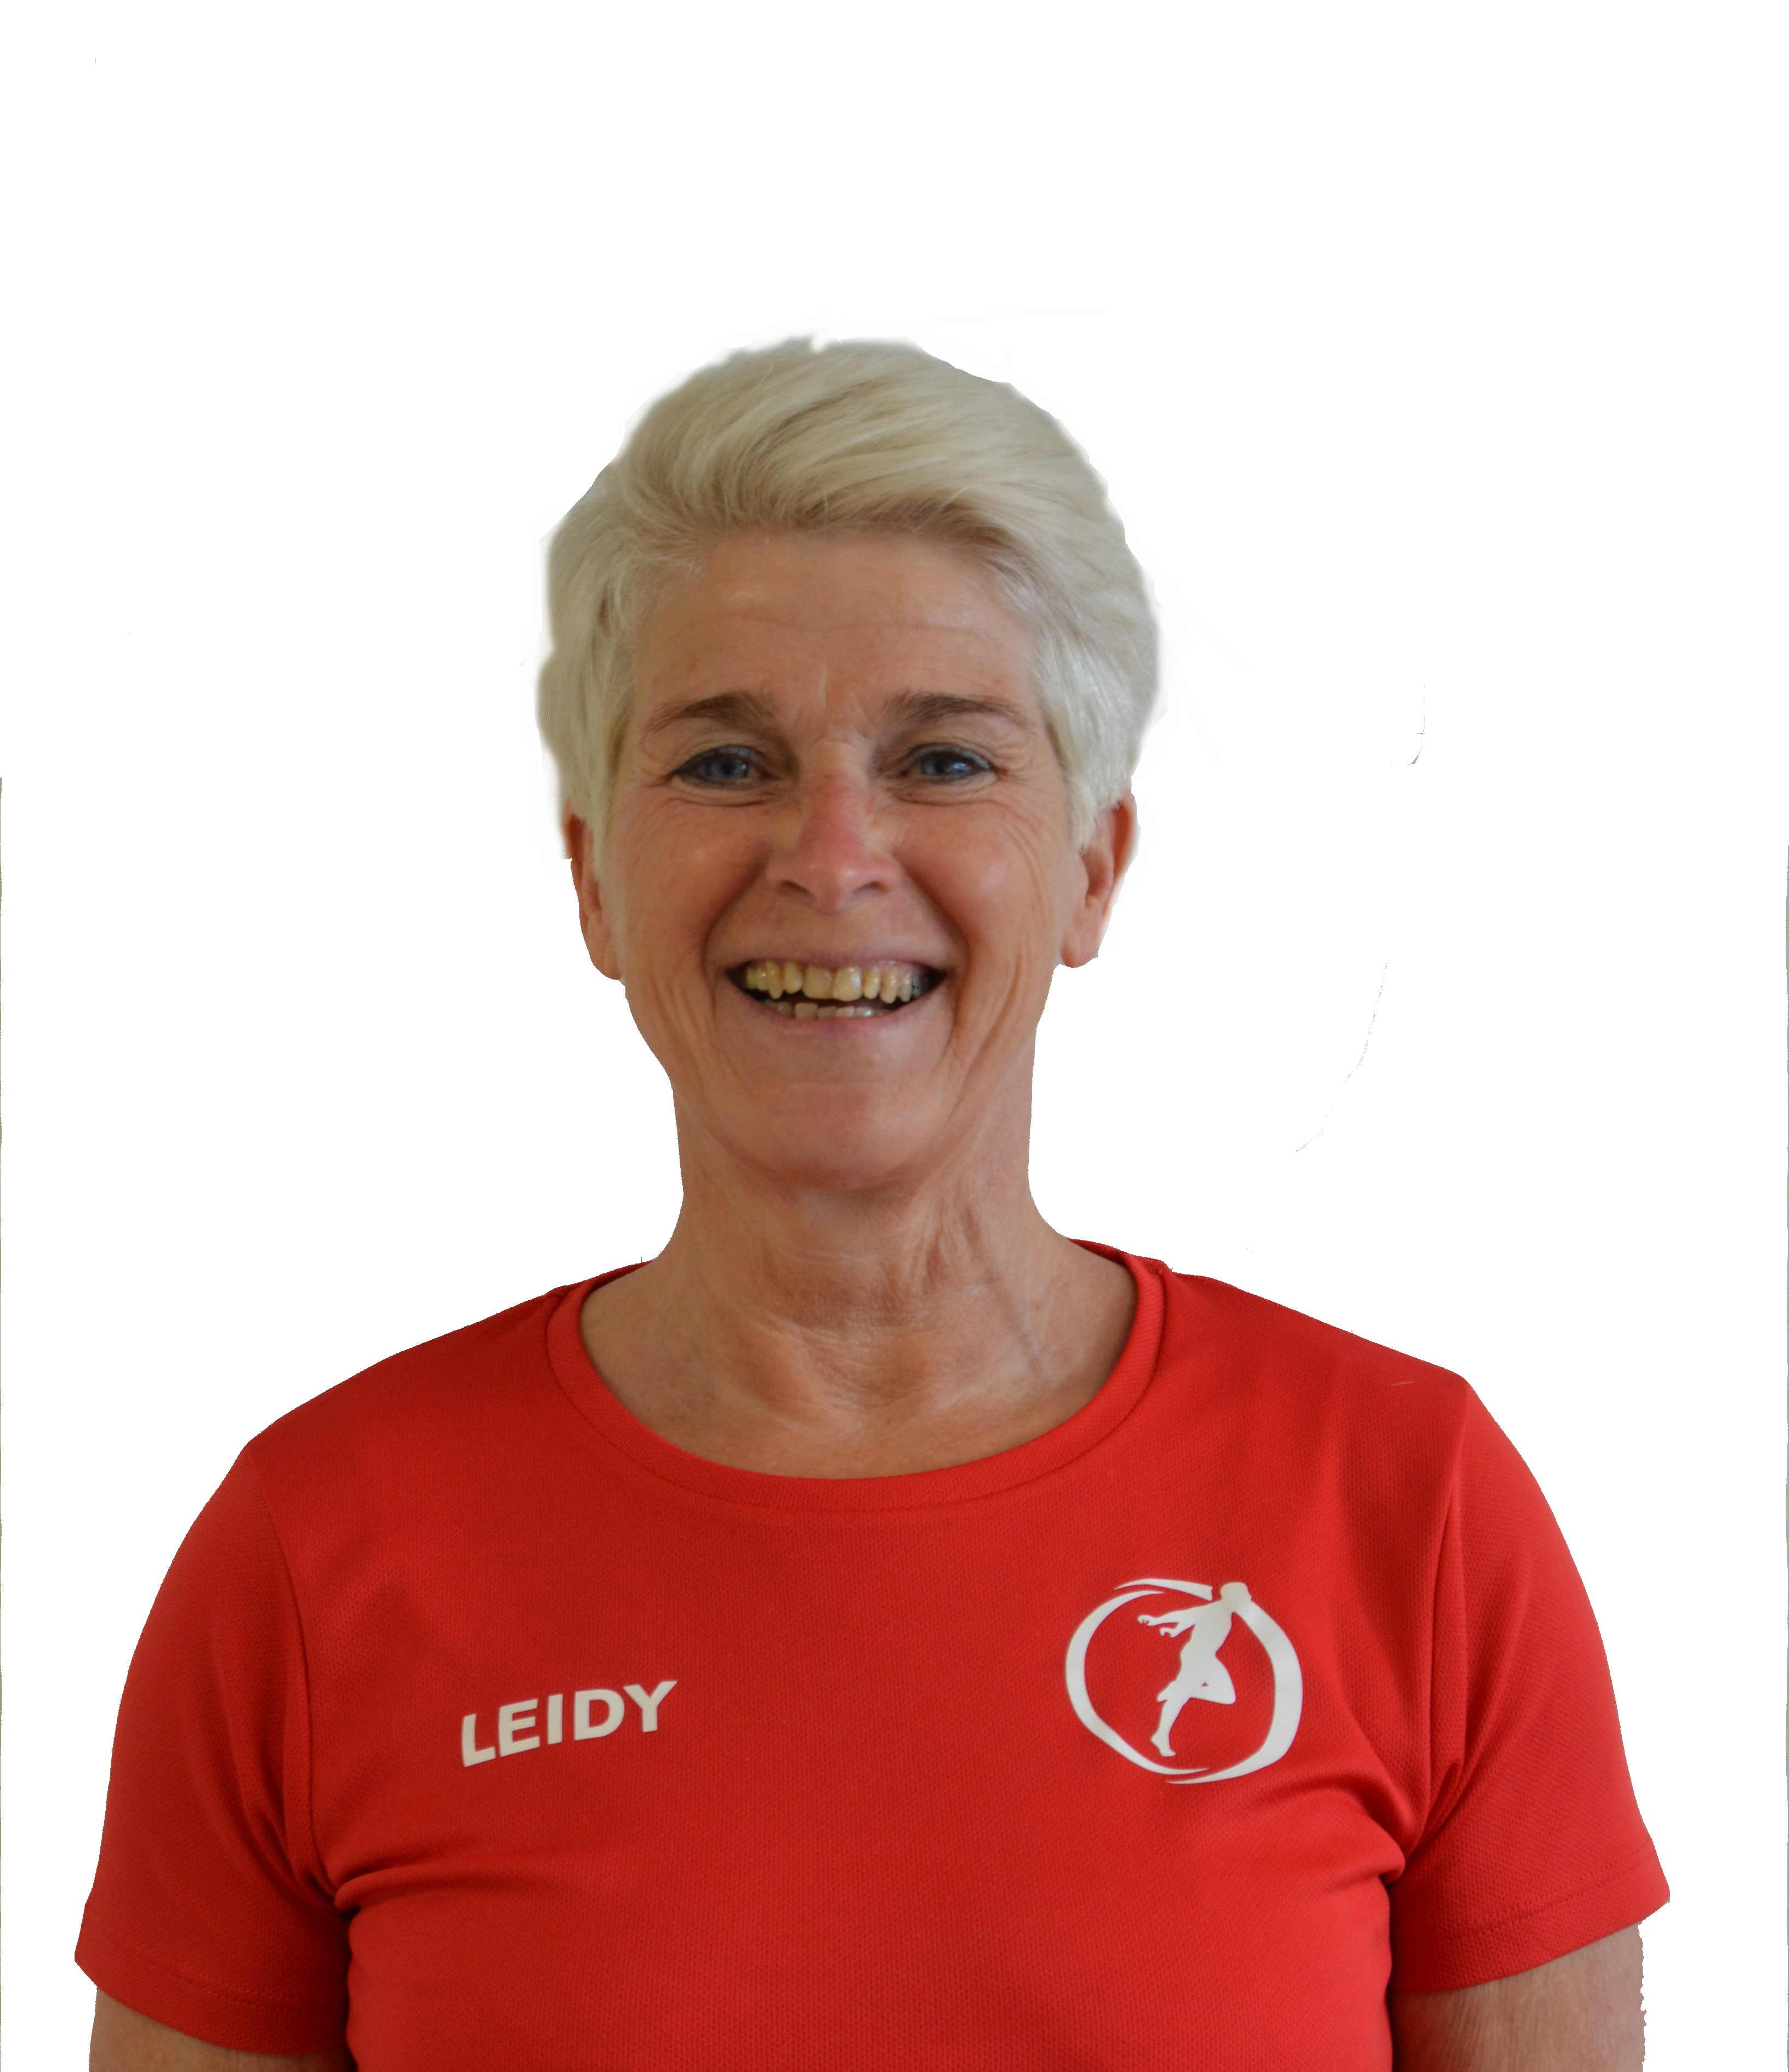 Leidy Vossebeld